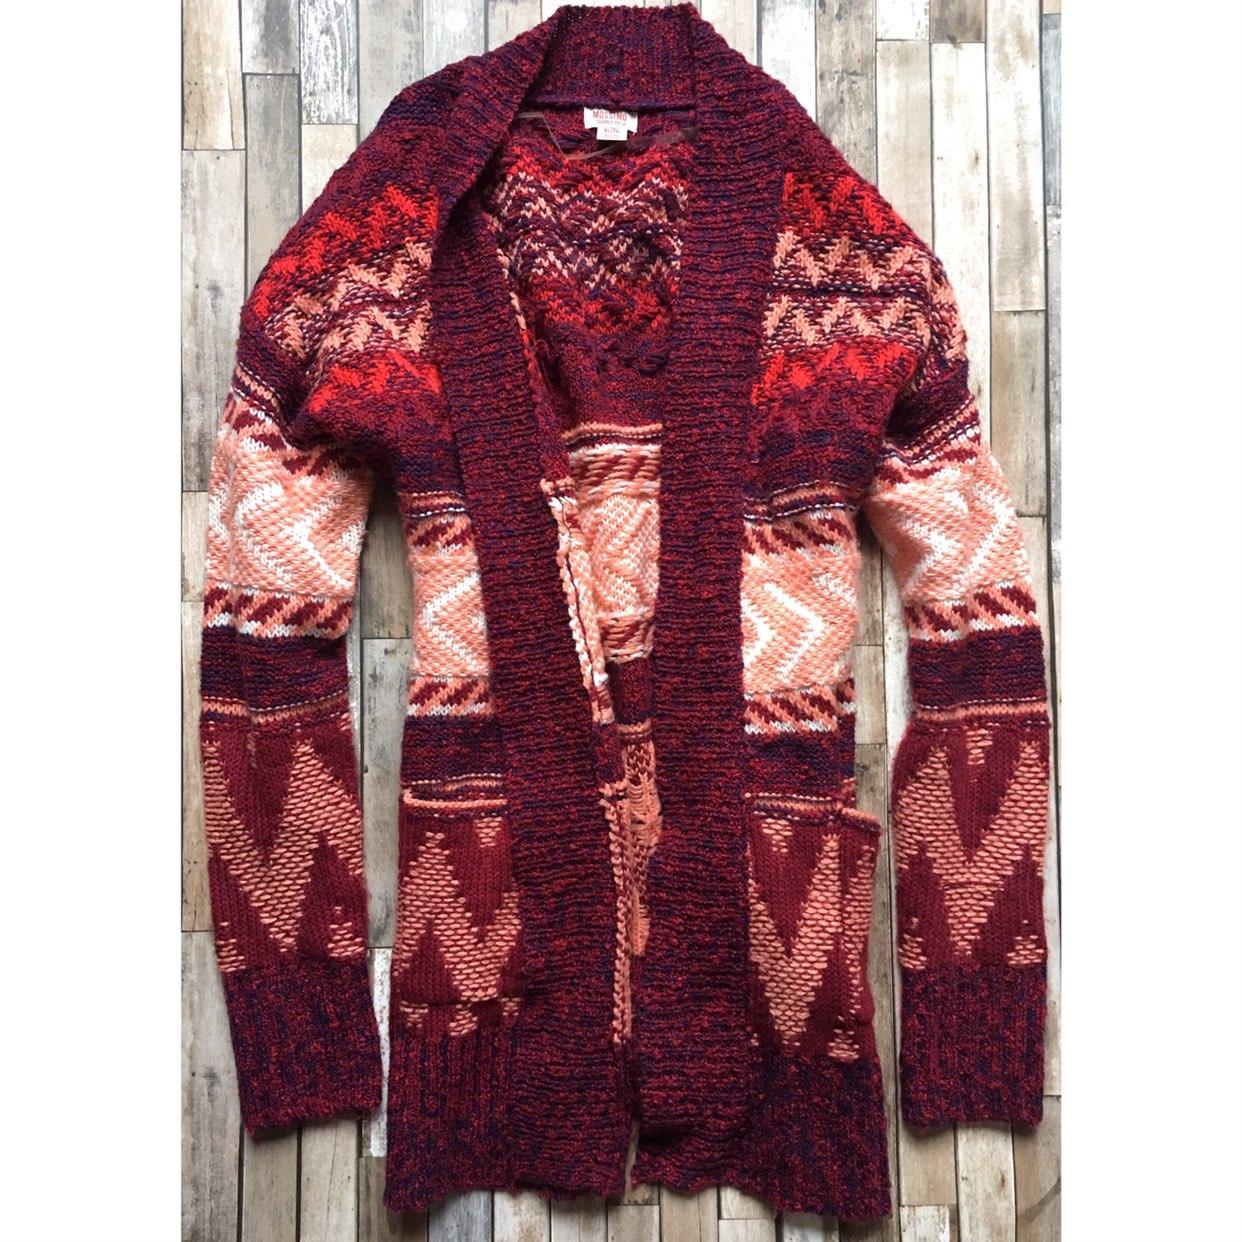 Tribal Oversized Knit Sweater Cardigan - Mercari: BUY & SELL ...